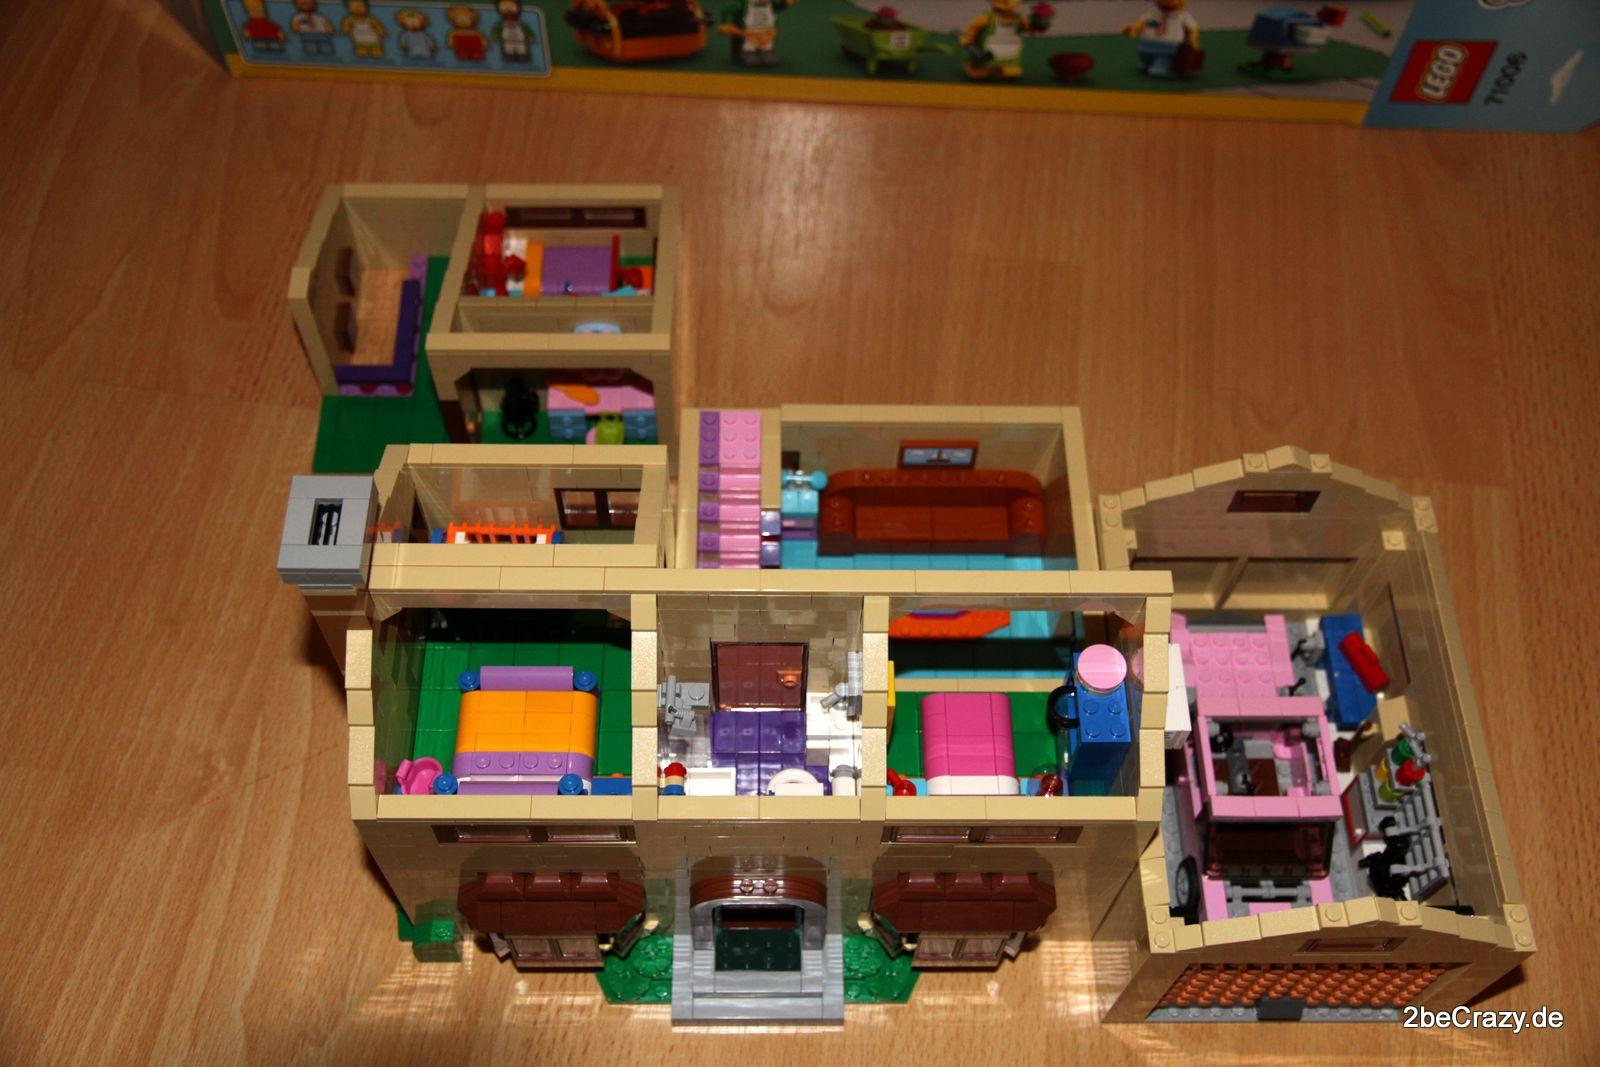 simpsons haus lego 85 2becrazy. Black Bedroom Furniture Sets. Home Design Ideas